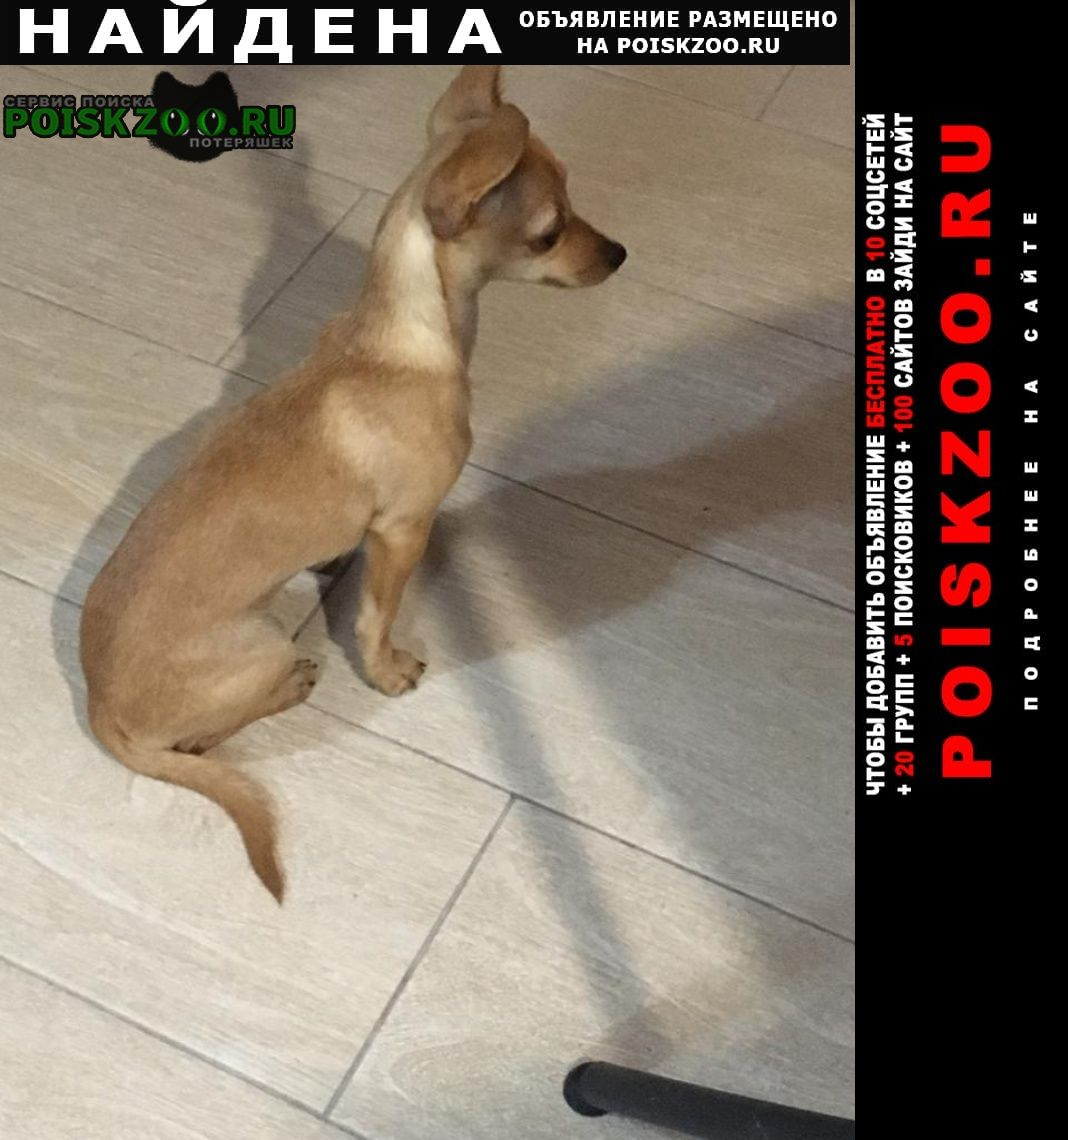 Найдена собака кобель той-терьер Сочи